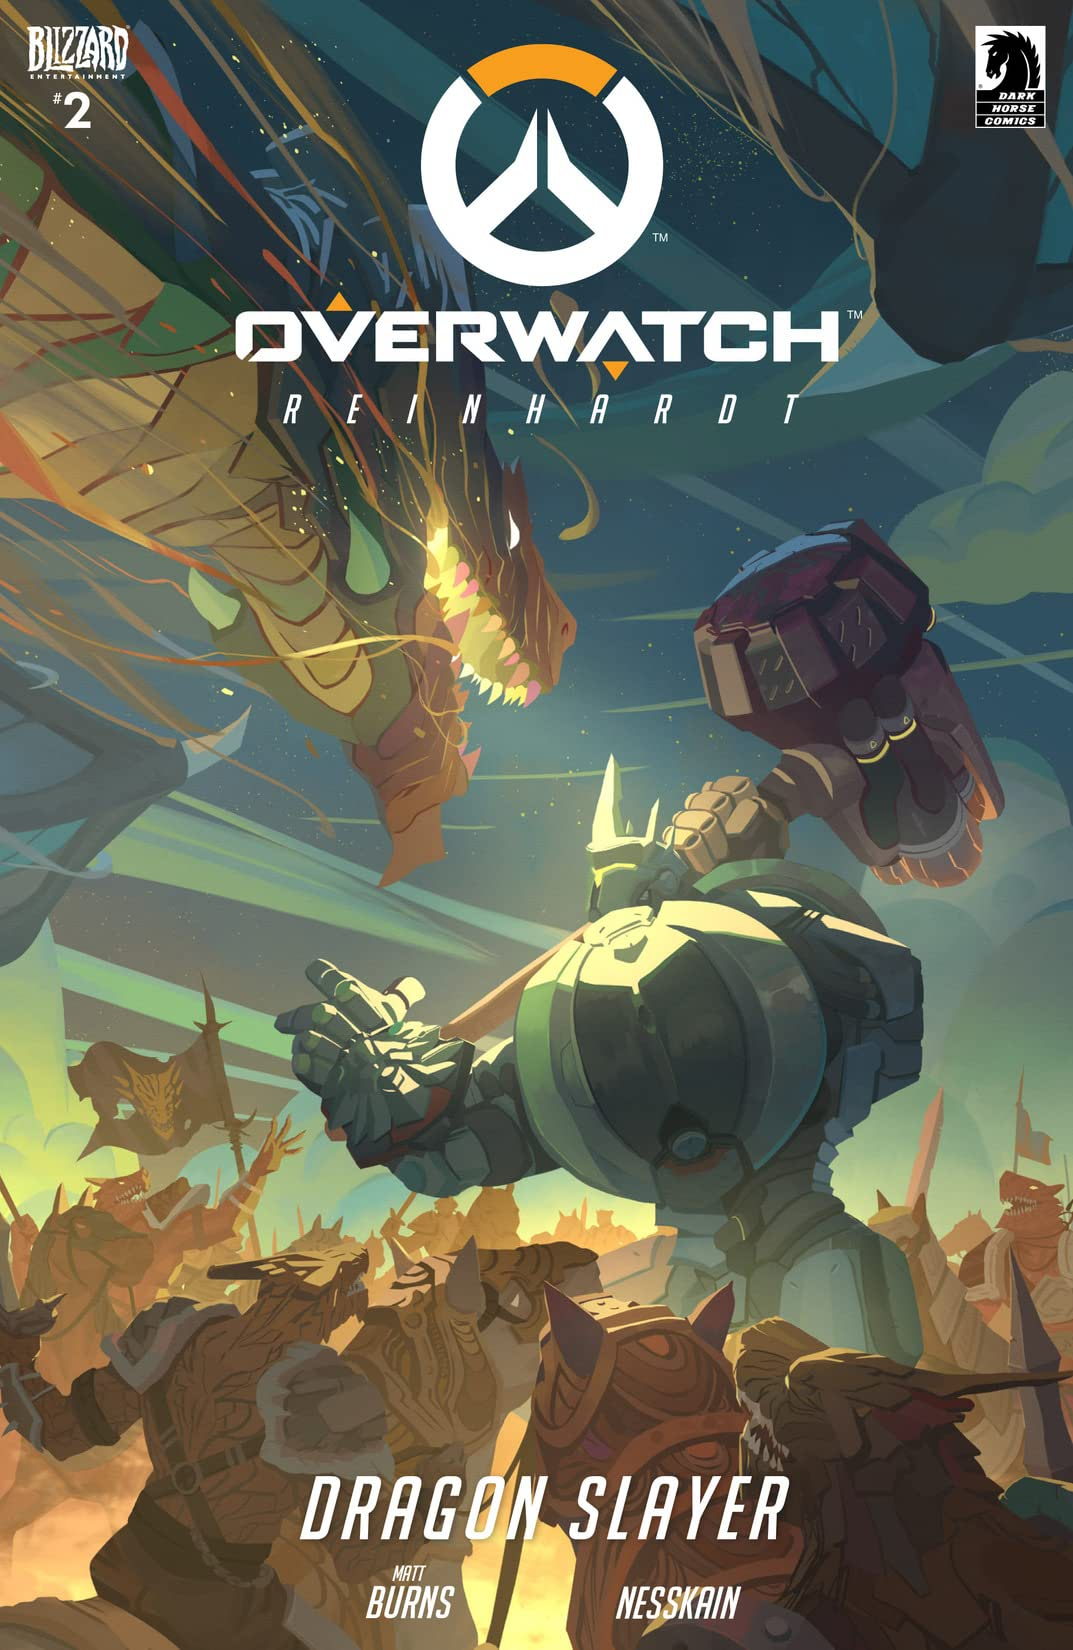 Overwatch #2